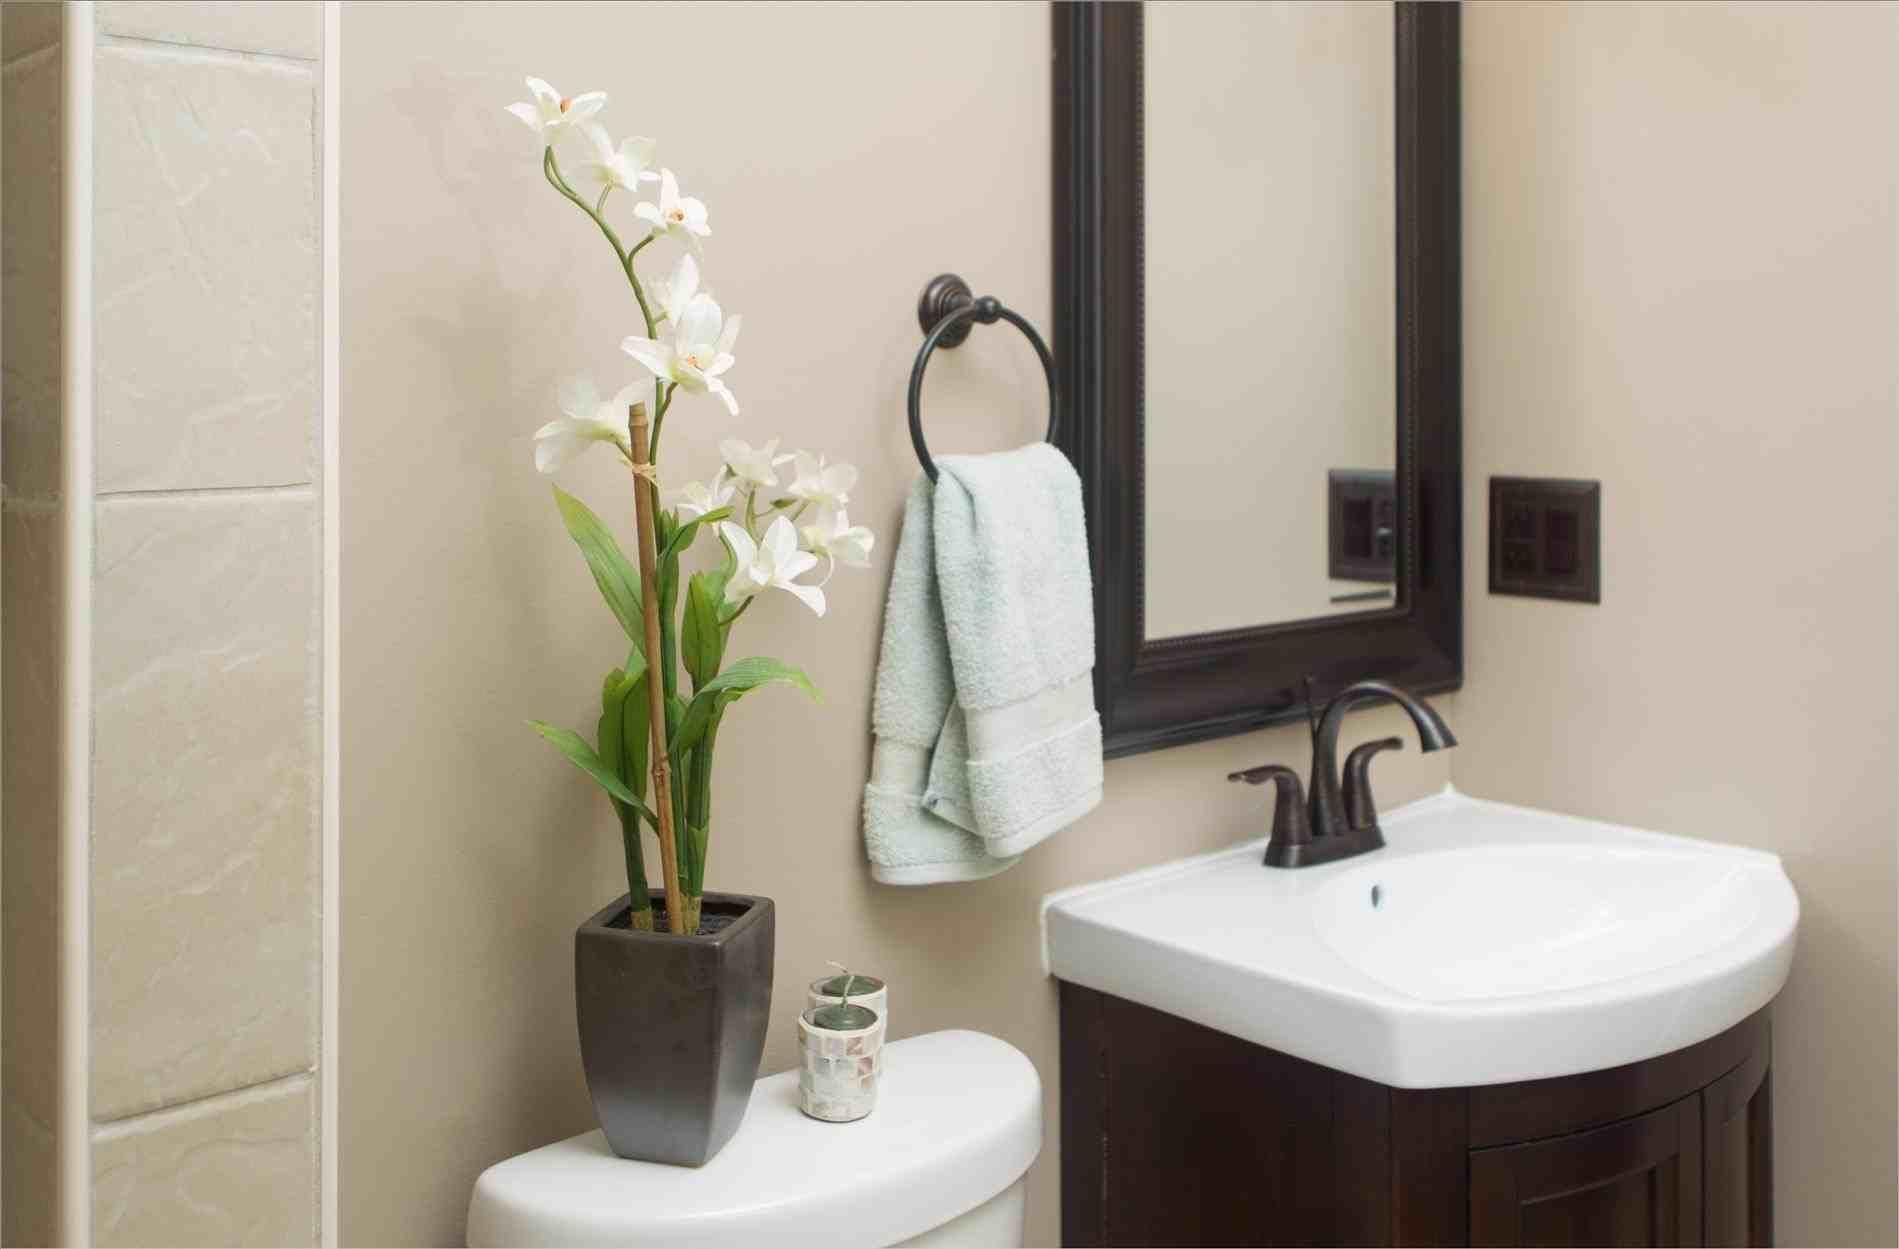 +25 TOP View post indian bathroom interior design pictures ...